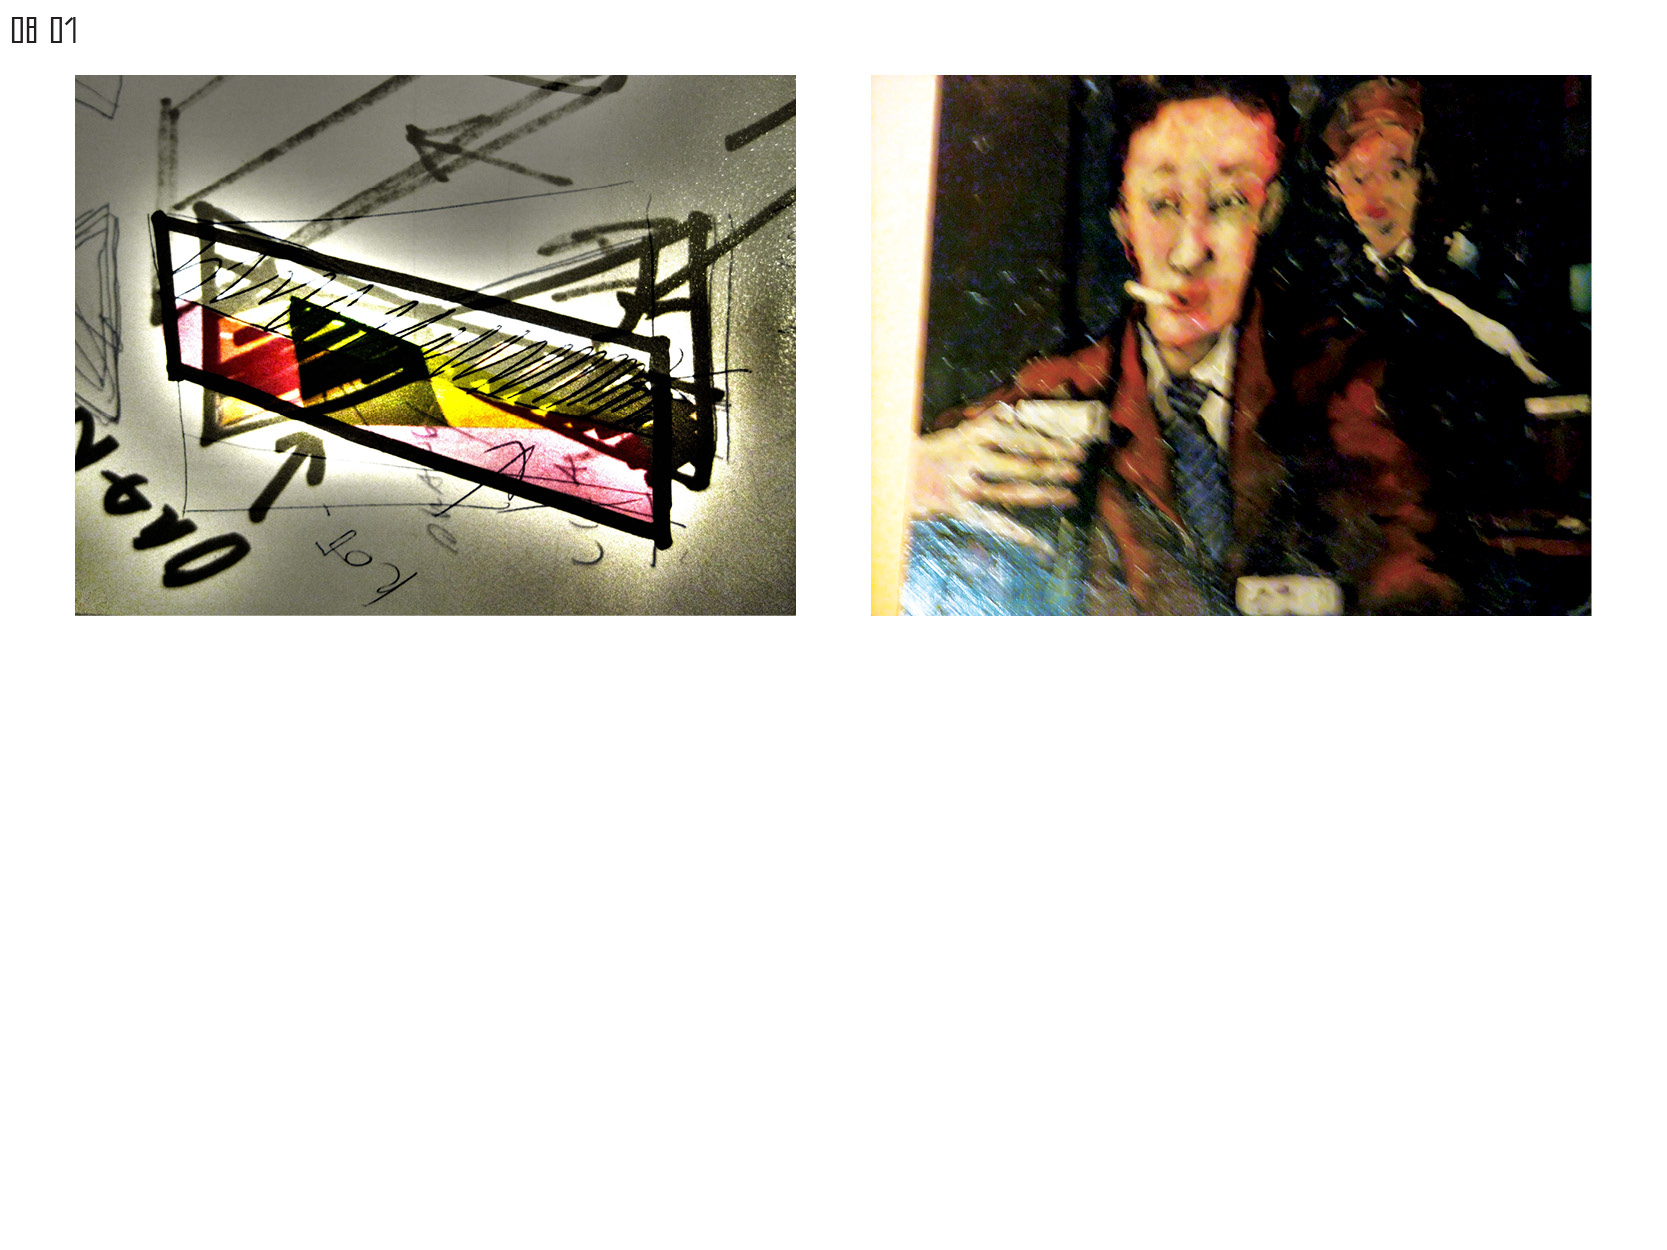 Gerrit-Schweiger-Dialog-Städte-Paris-Berlin-Jessica-Blank-Experiment-Fotoserie-Tagebuch-visuelle-Kommunikation-69